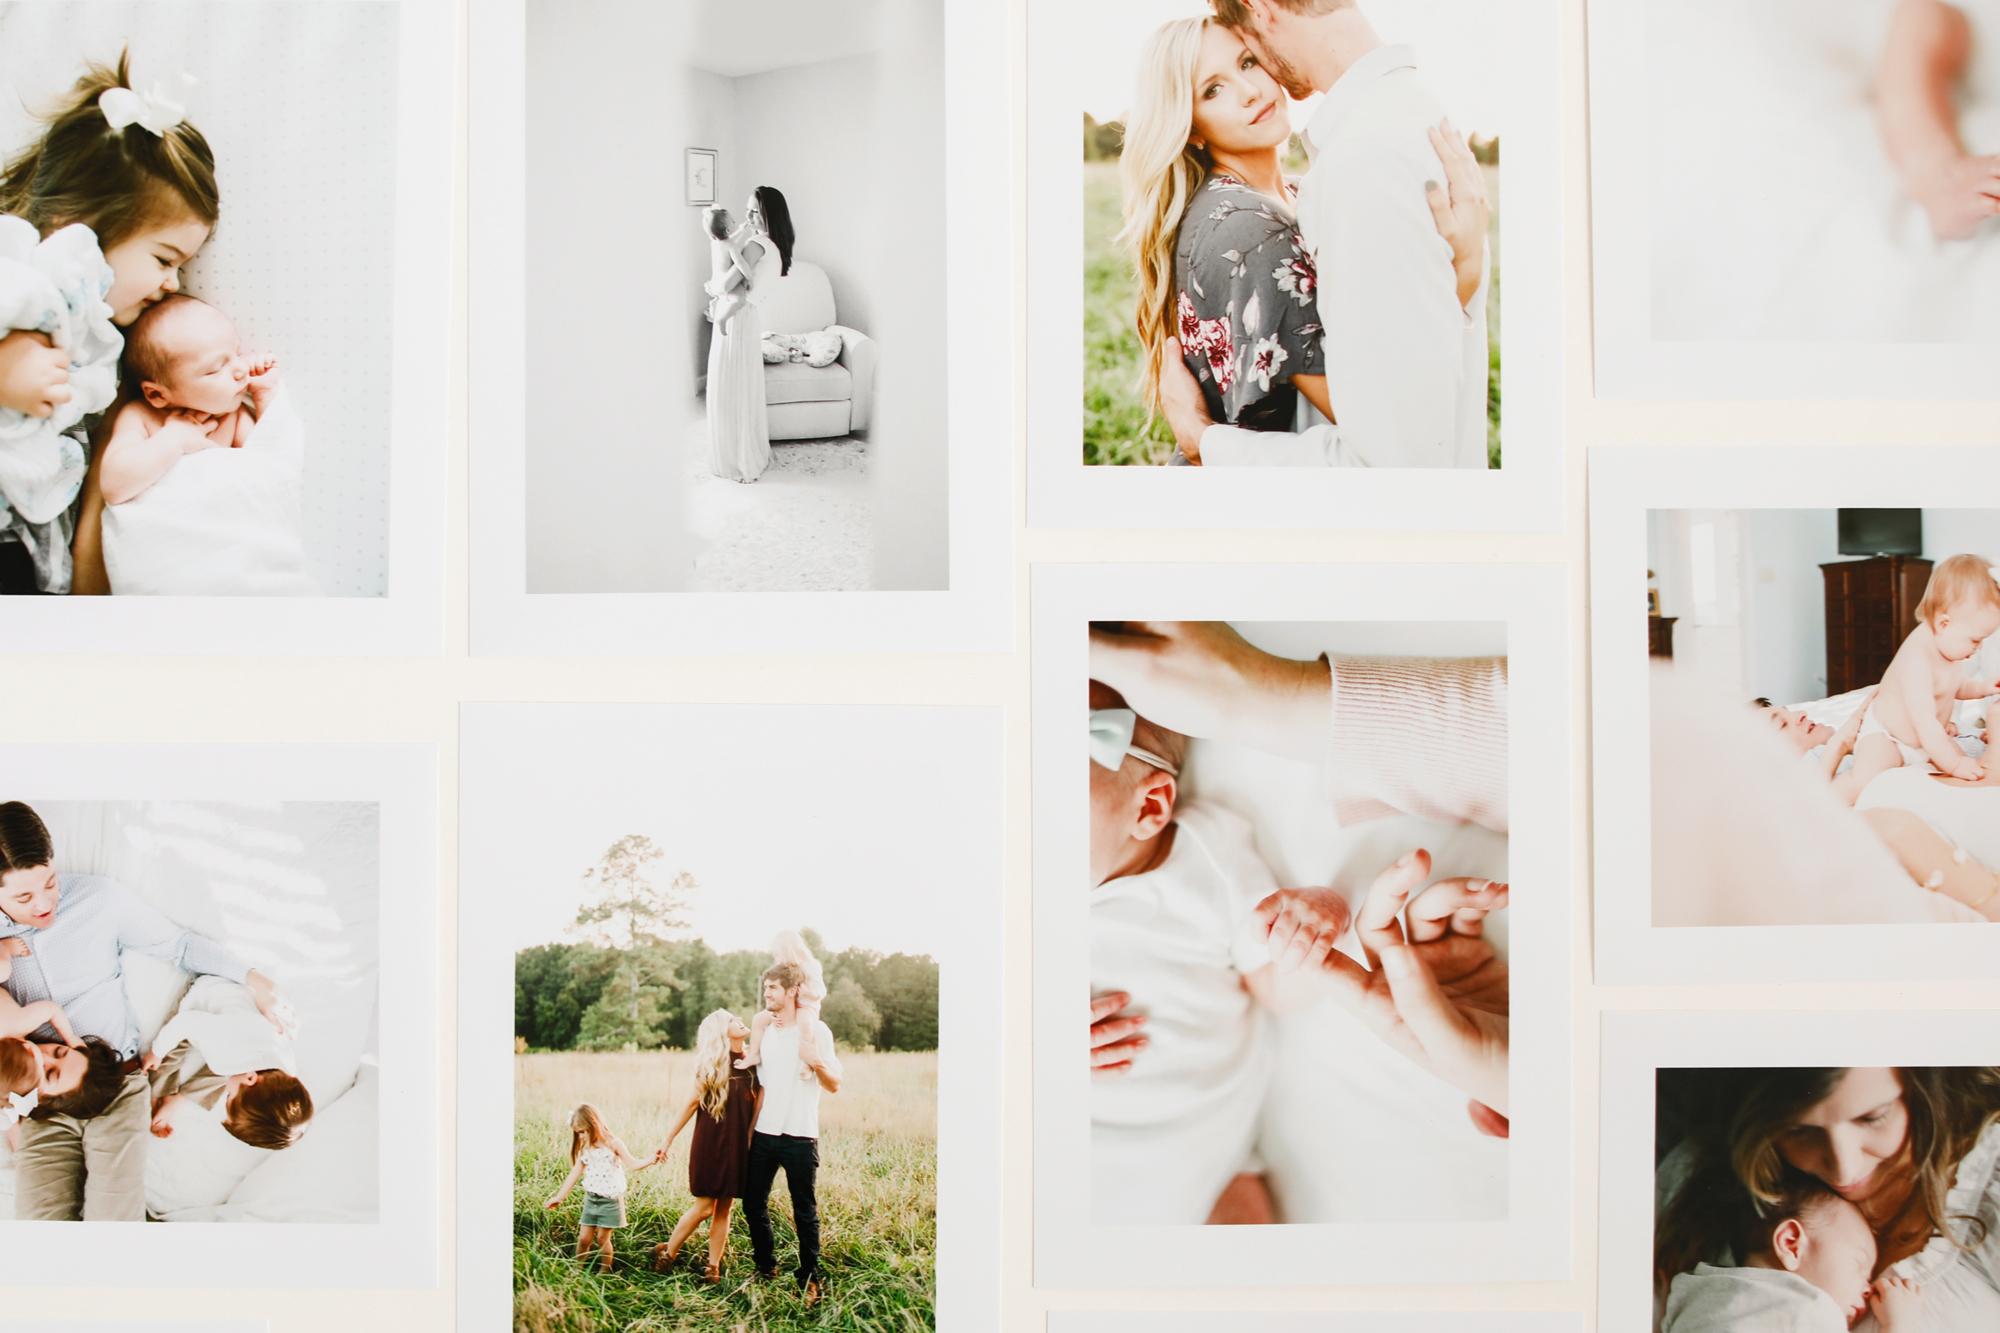 raleigh-lifestyle-newborn-film-photographer-albums-baby-books-002